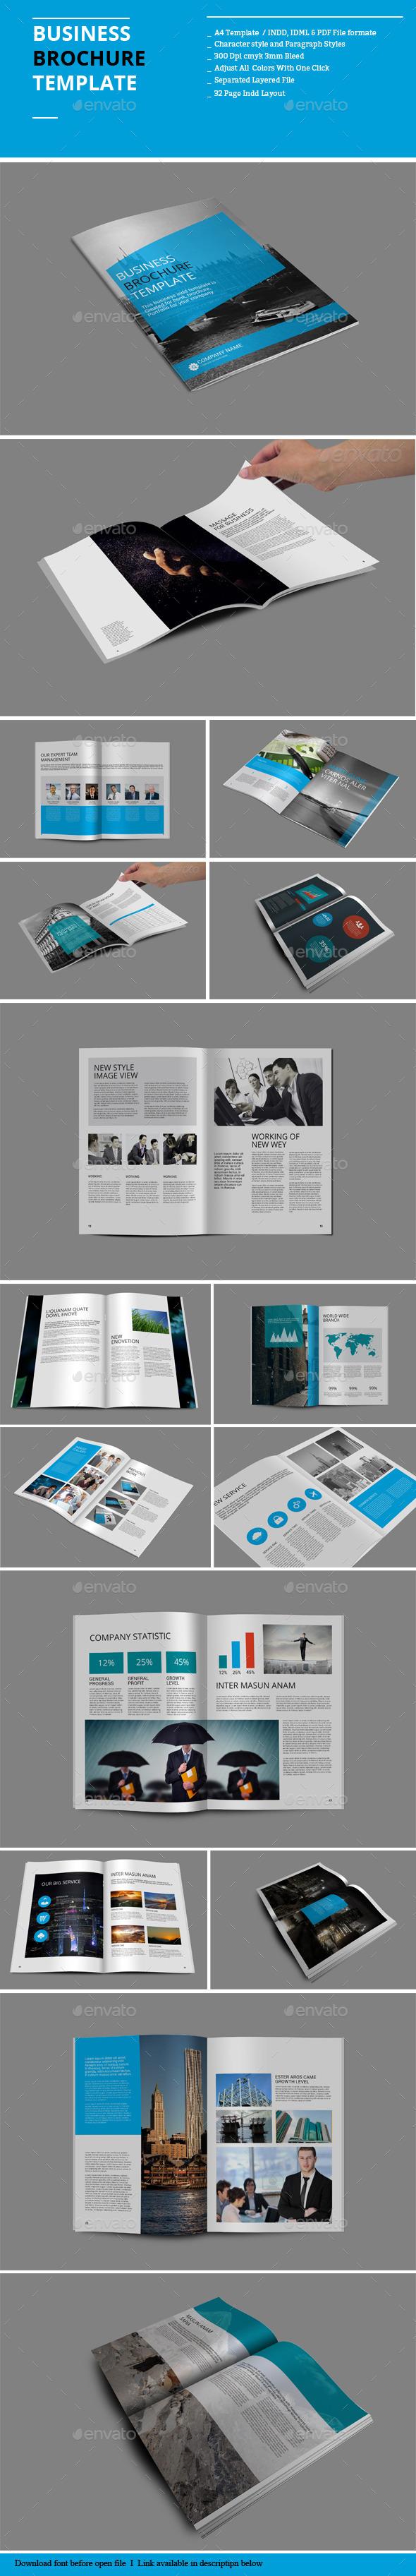 Business Brochure Templates - Corporate Brochures